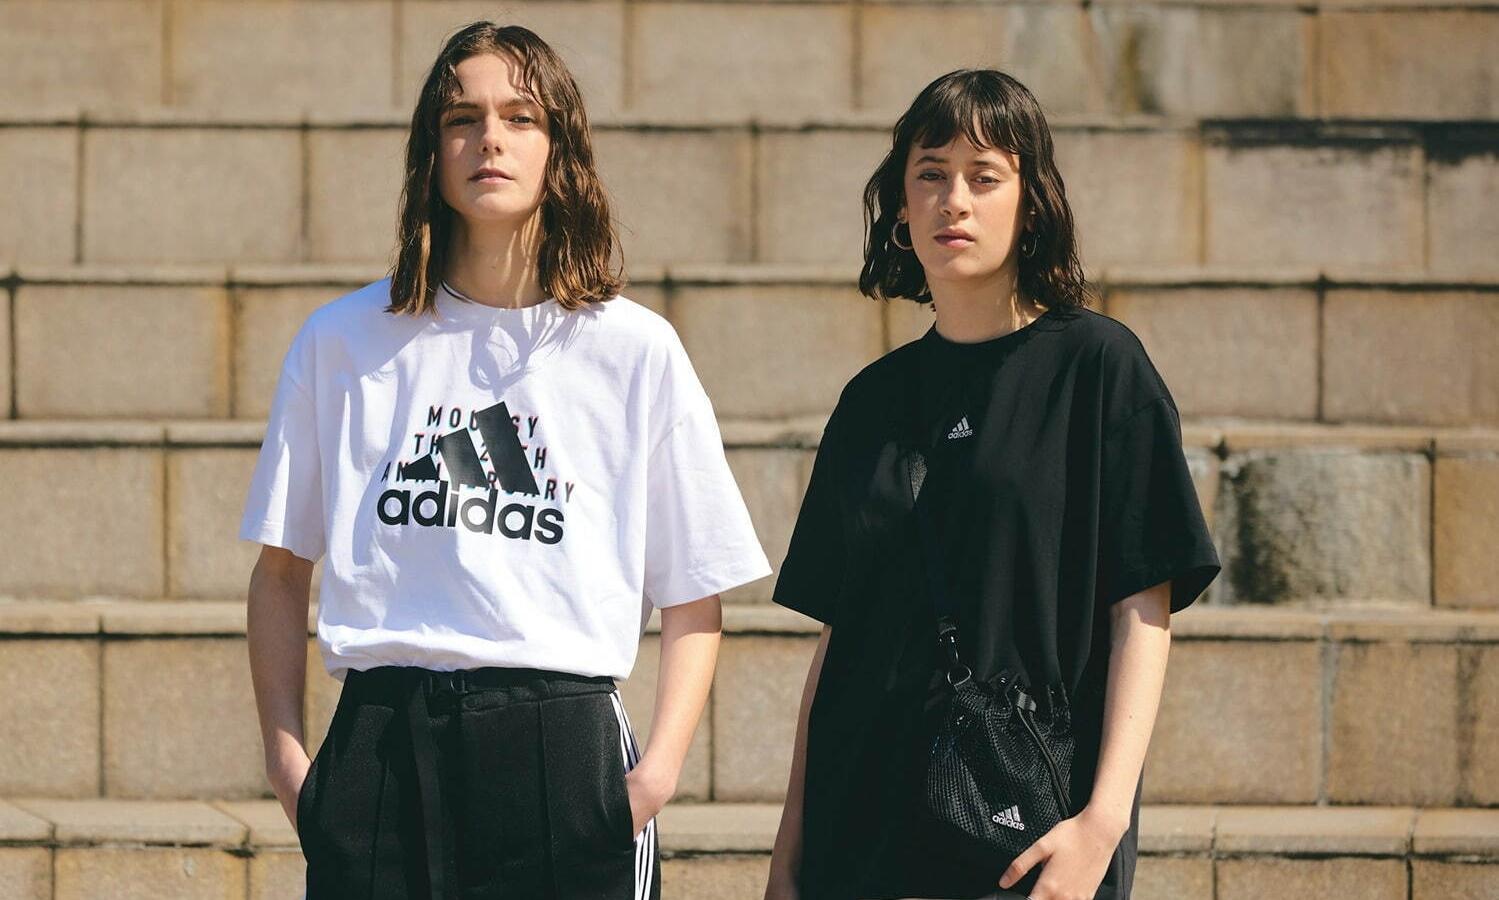 adidas x MOUSSY 再度合作推出新系列产品